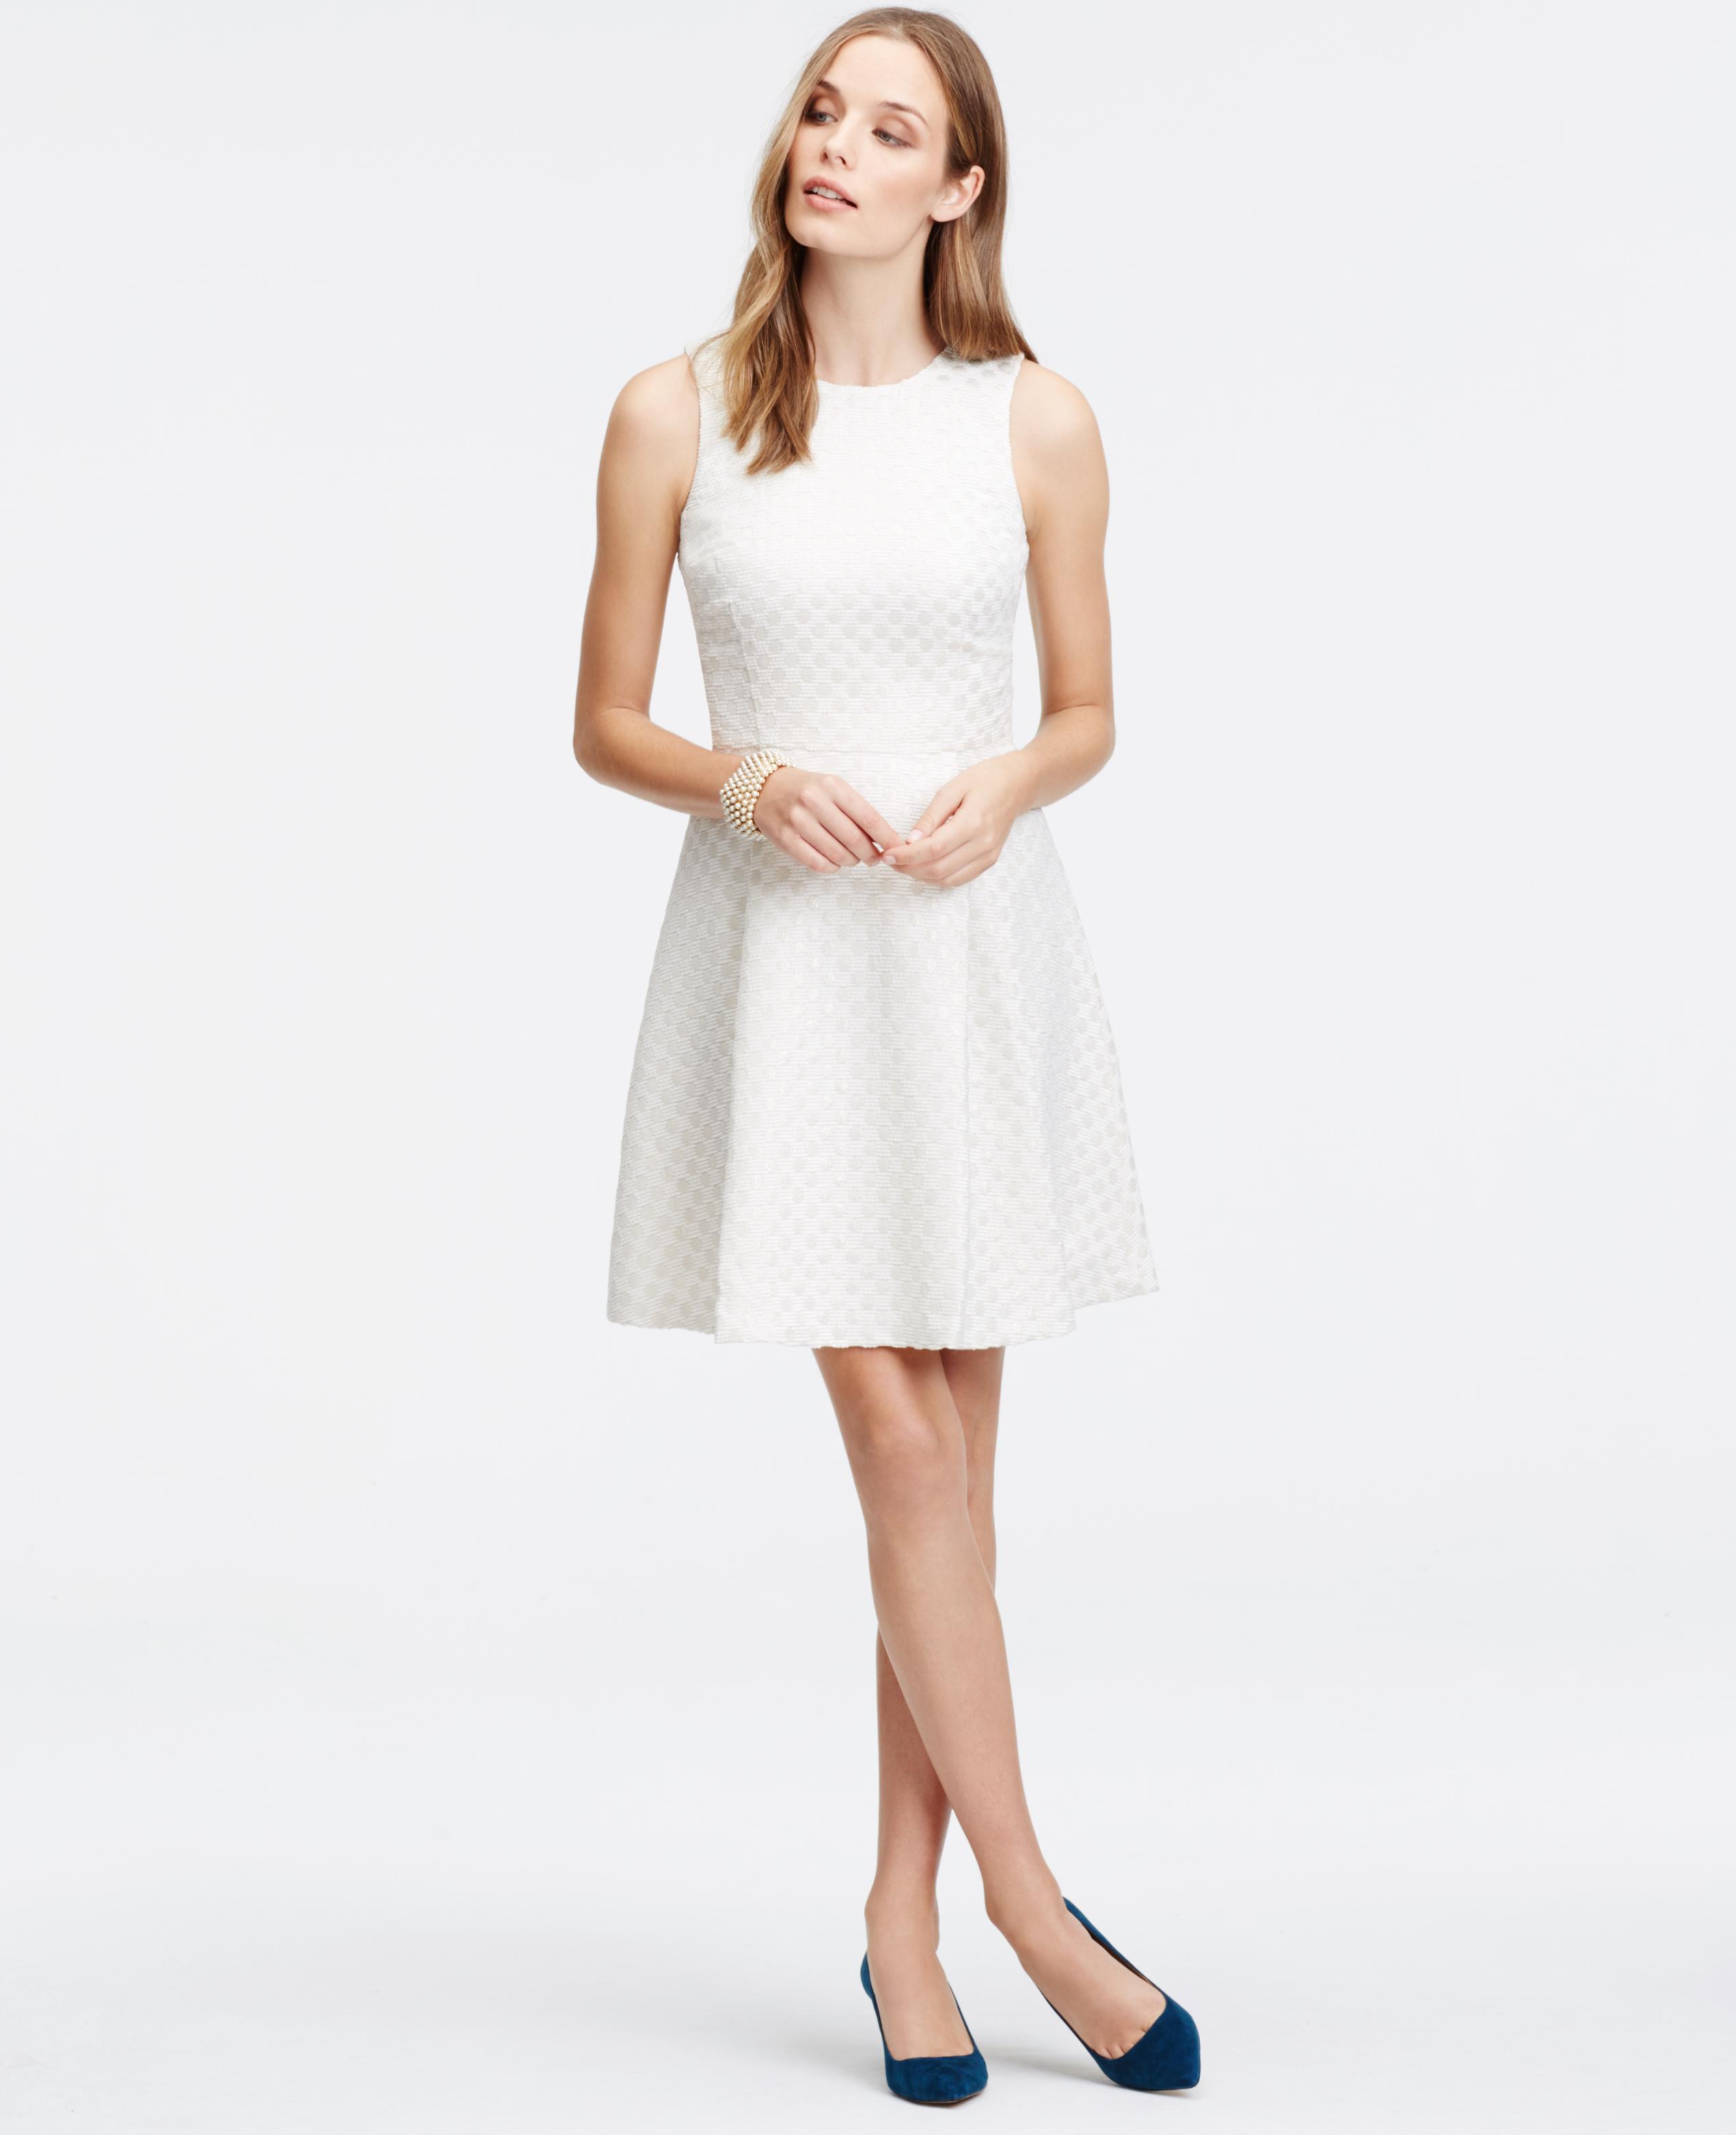 Lyst - Ann Taylor Petite Shimmer Dot Jacquard Flare Dress in White